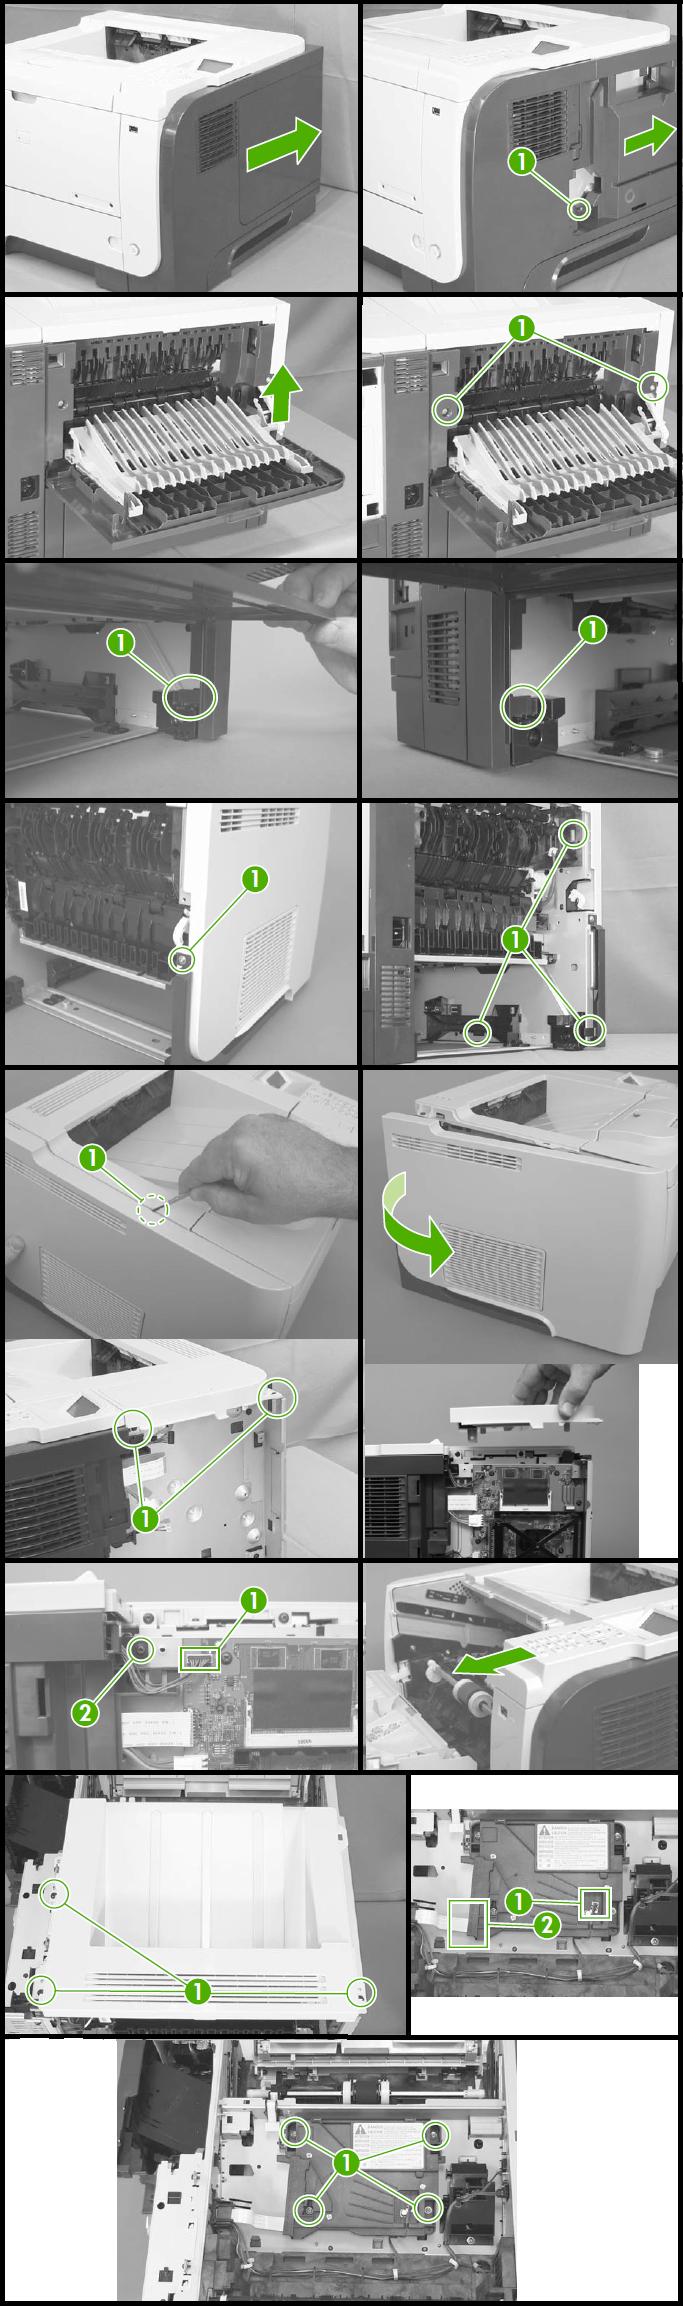 51 10 Error- HP Laserjet P3015 Printer - Laser Scanner Error